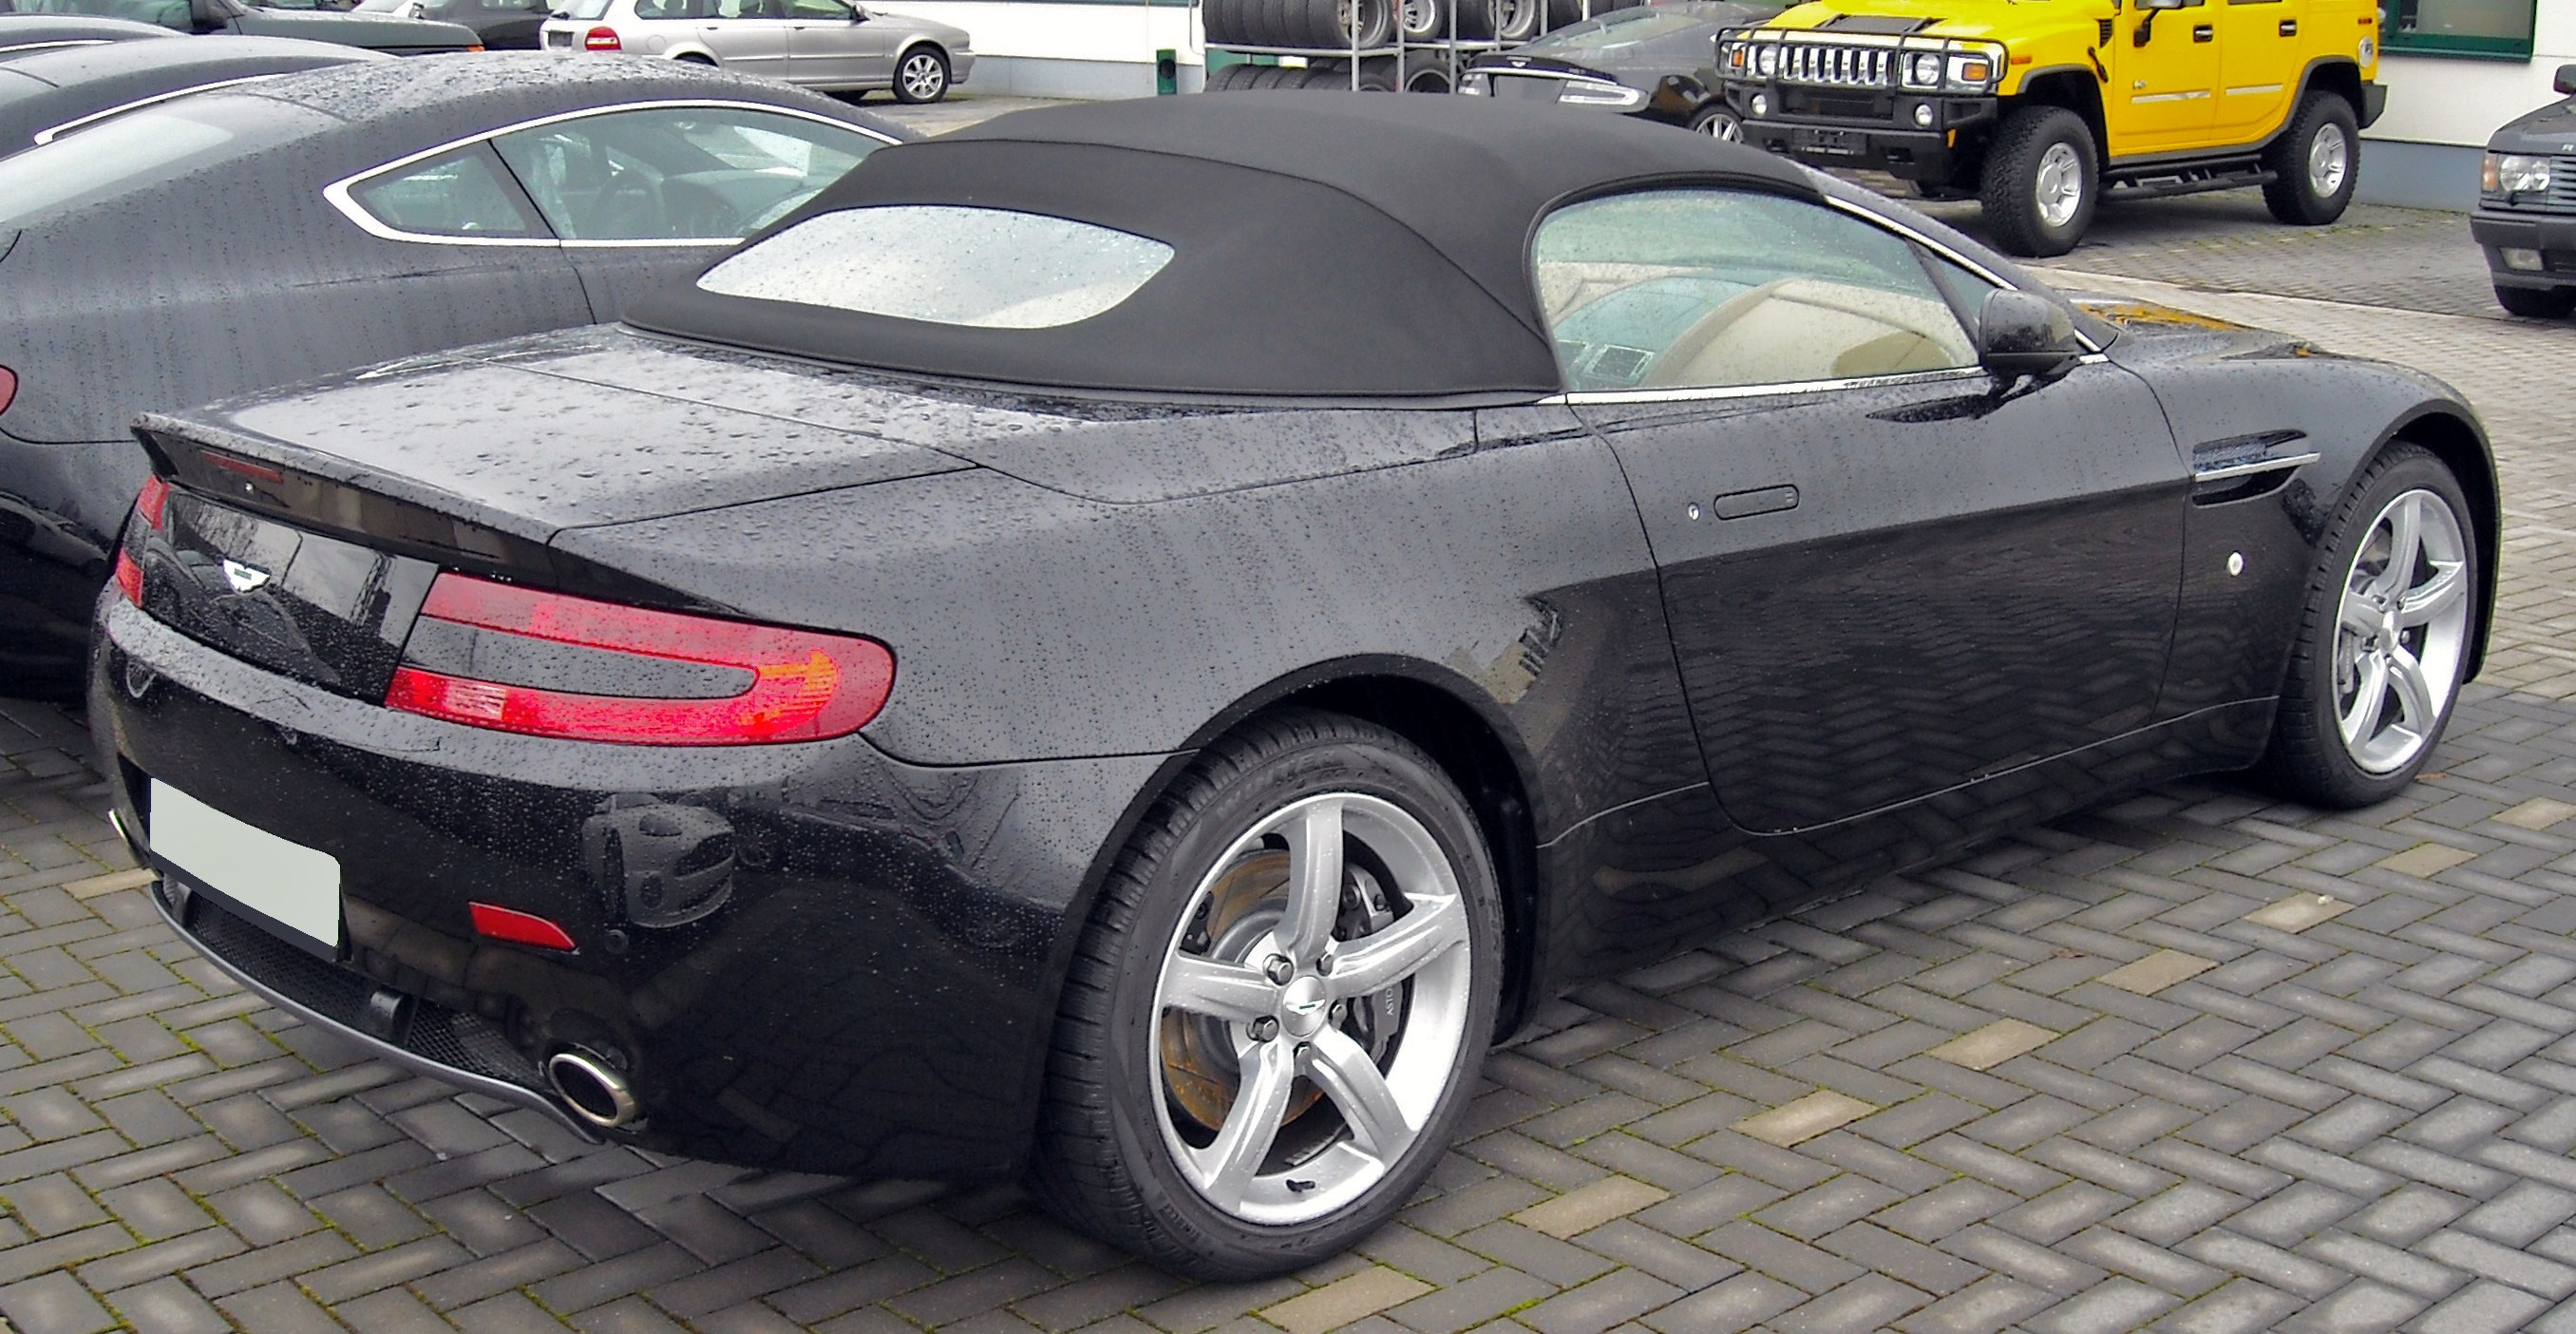 Aston Martin One 77 additionally Top 50 Luxury Cars Interior in addition File Aston Martin V8 Vantage Roadster rear 20081204 additionally Maserati Granturismo Mc Stradale Luxo E as well 2002 Chevrolet Corvette Z06 27b257fe10ebd985. on 2008 aston martin db9 coupe